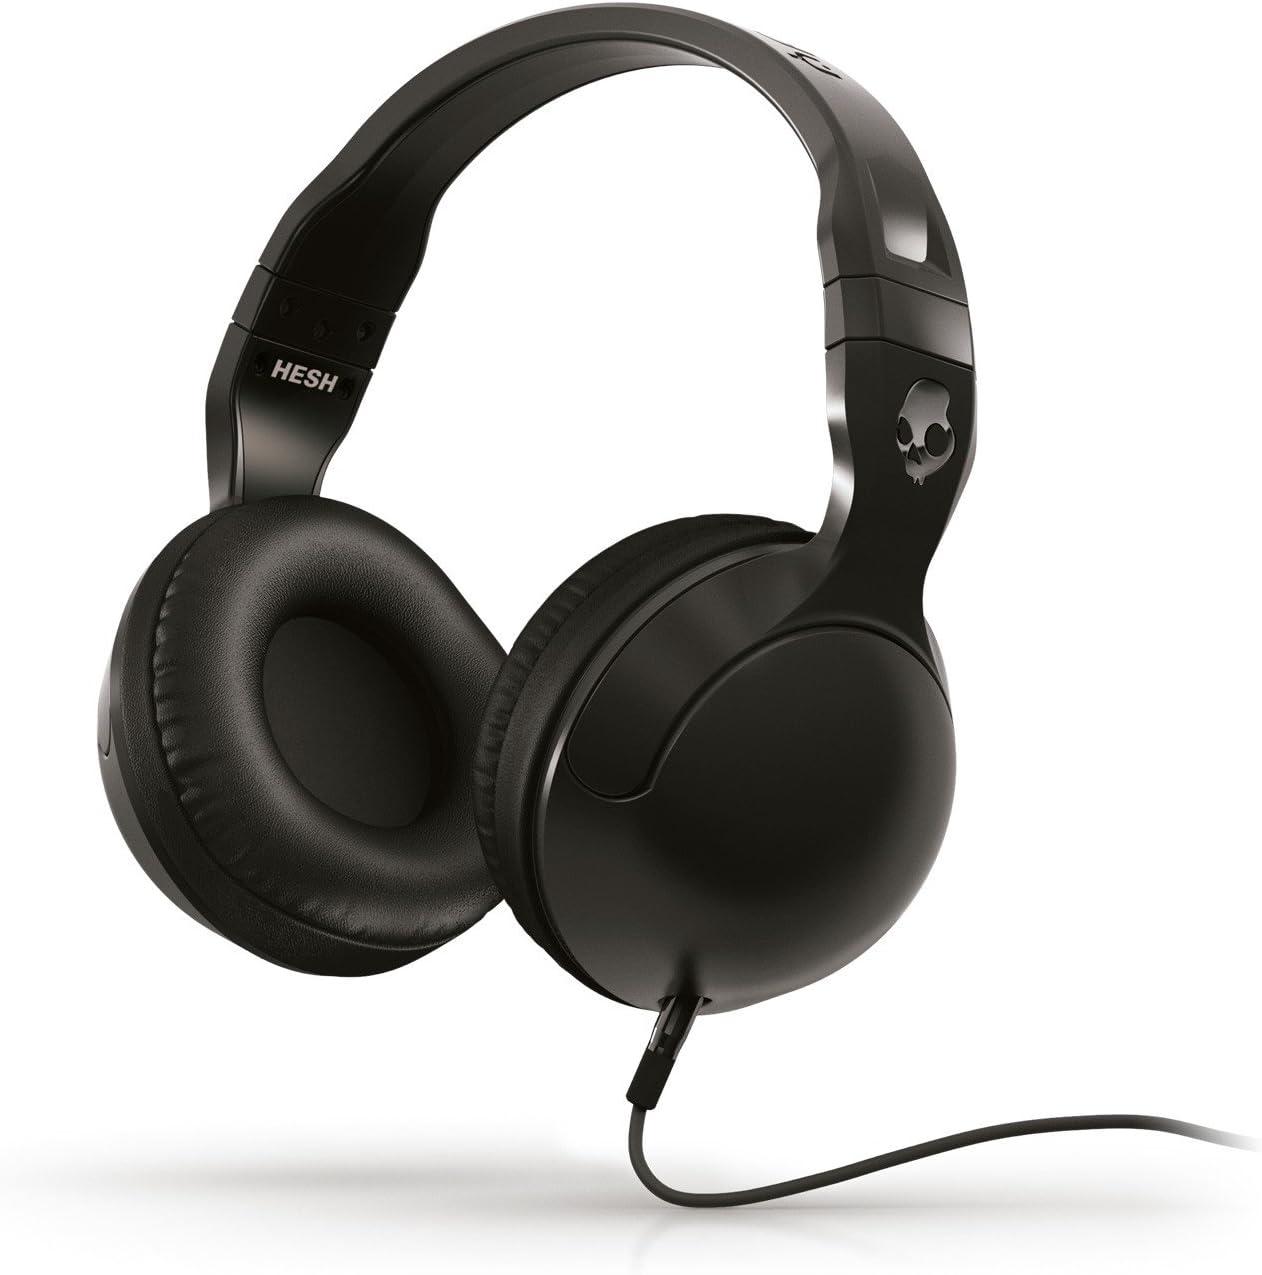 Skullcandy Hesh 2 Over-Ear Headphones with Mic – Black